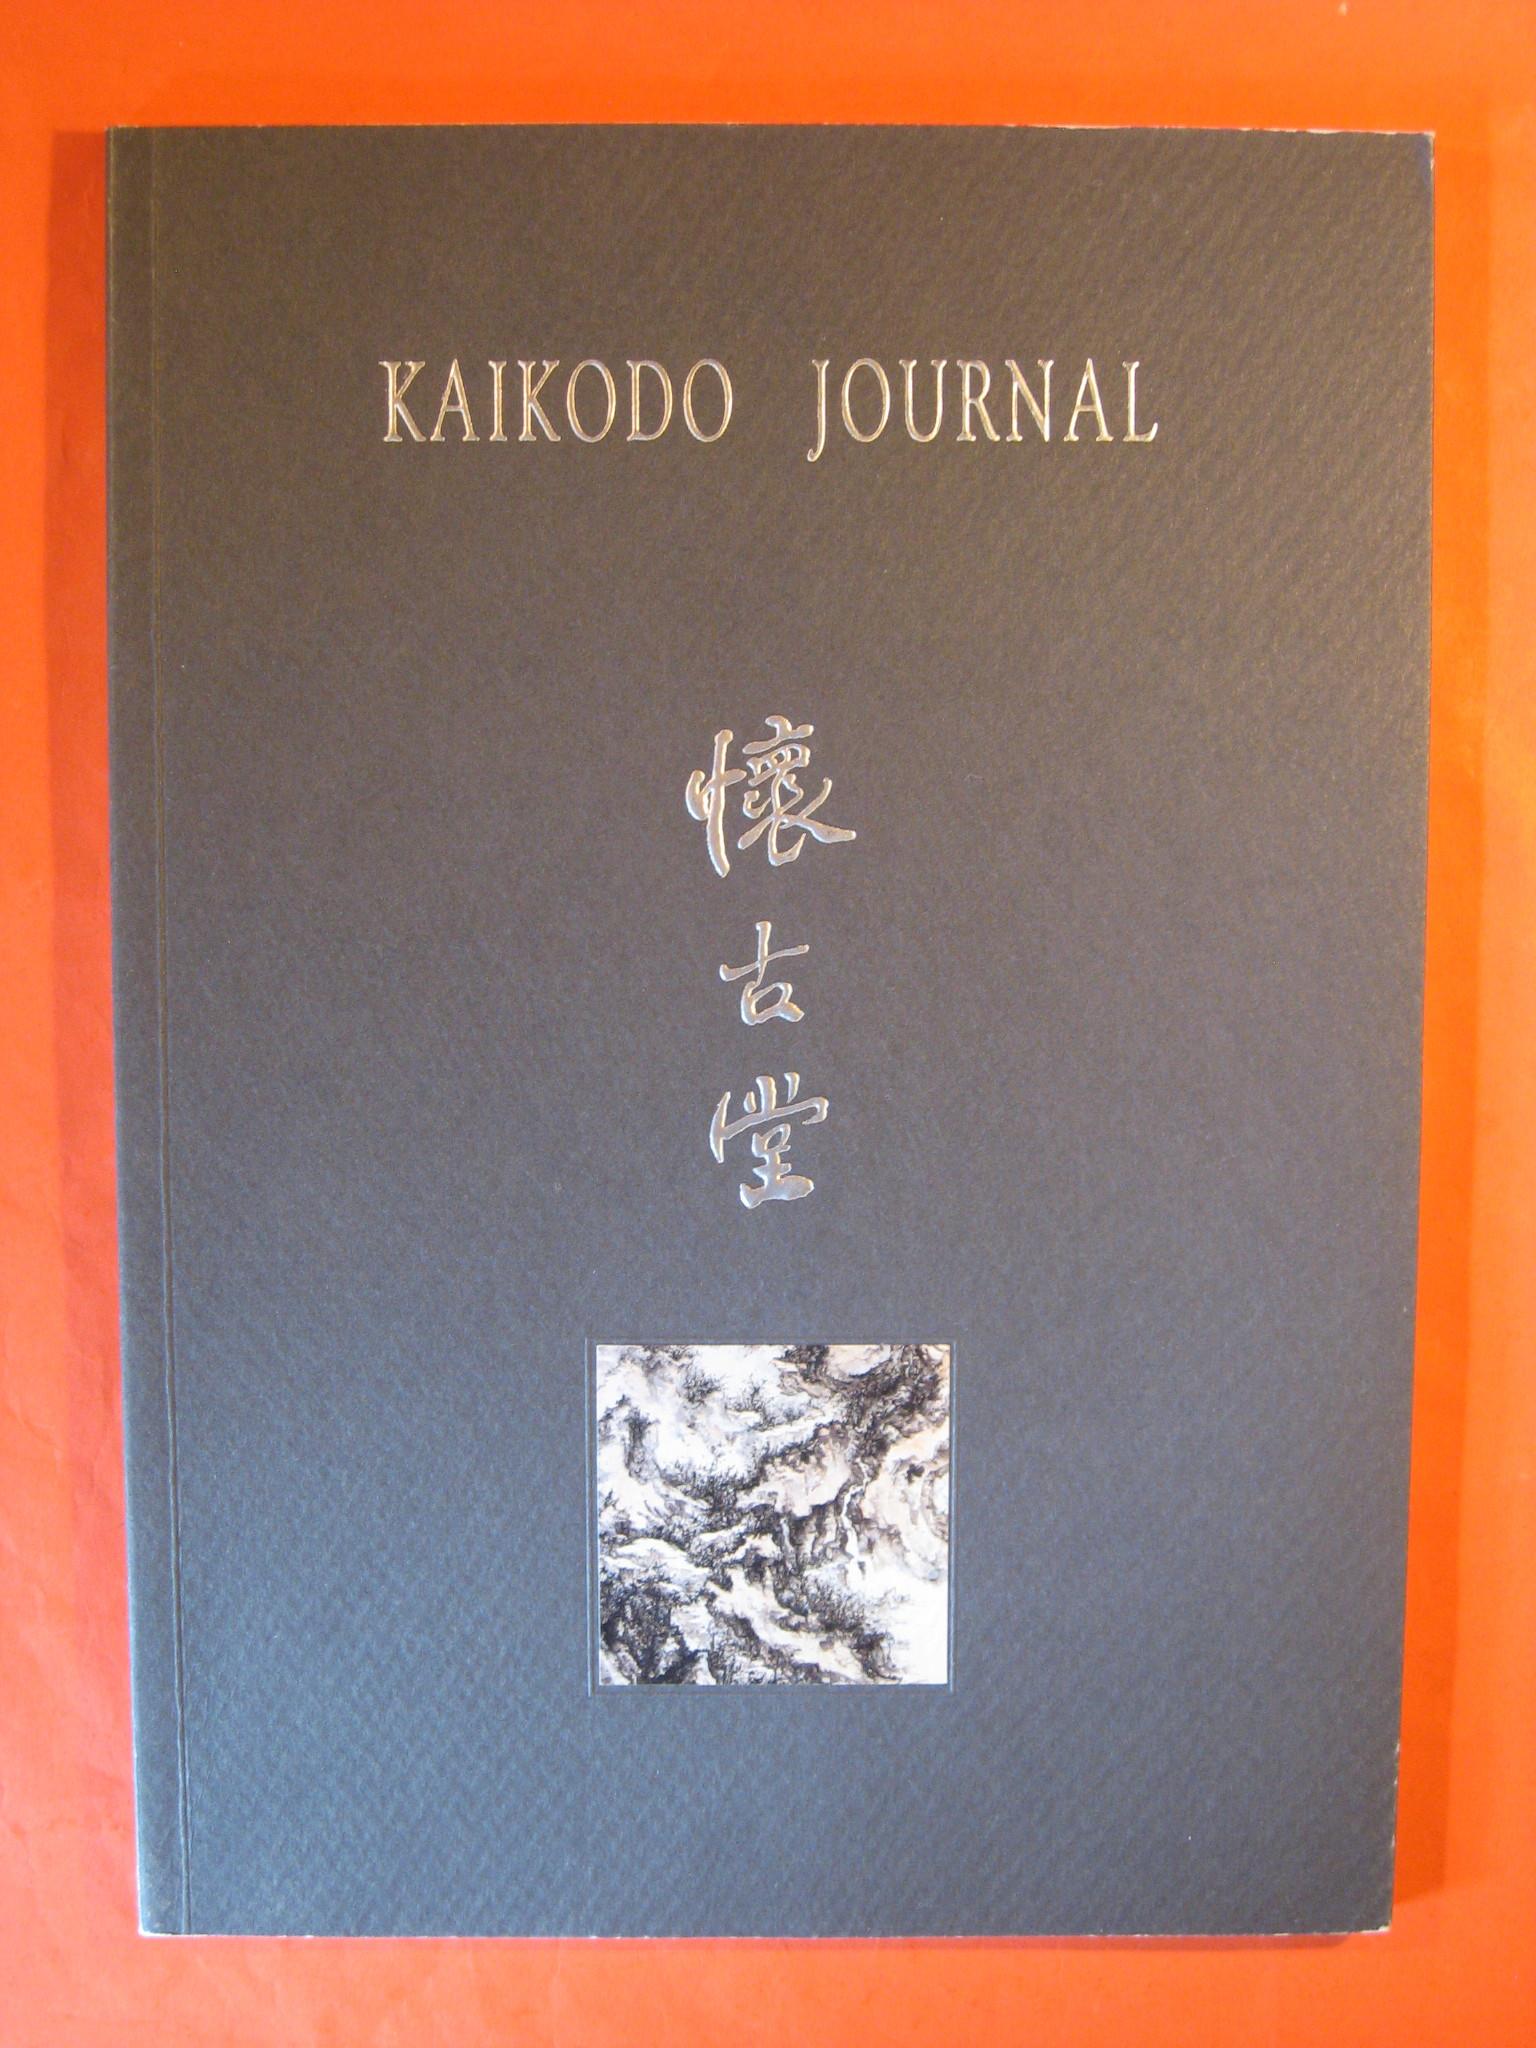 Kaikodo Journal:  Unperturbed:  The Art of Huang Zhongfang (Harold Wong), Huang Zhongfang; Harold Wong